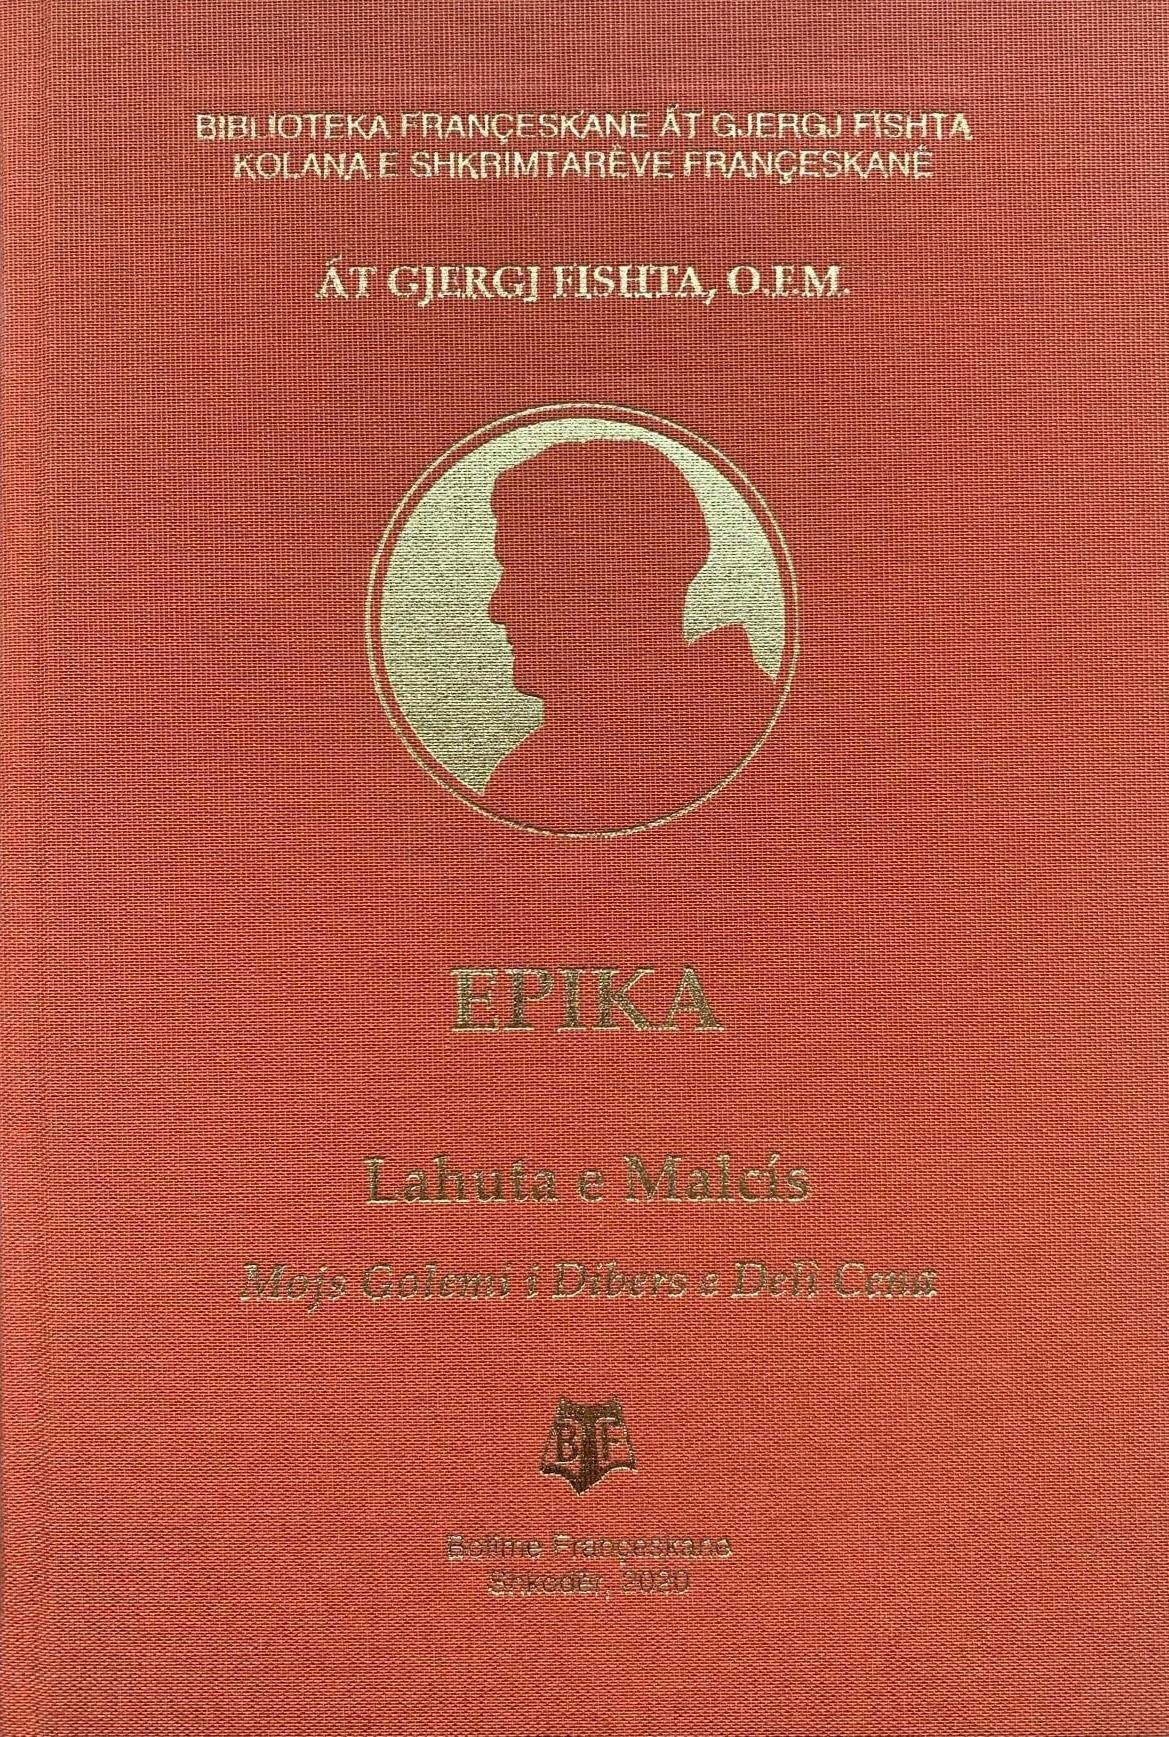 Epika – Gjergj Fishta